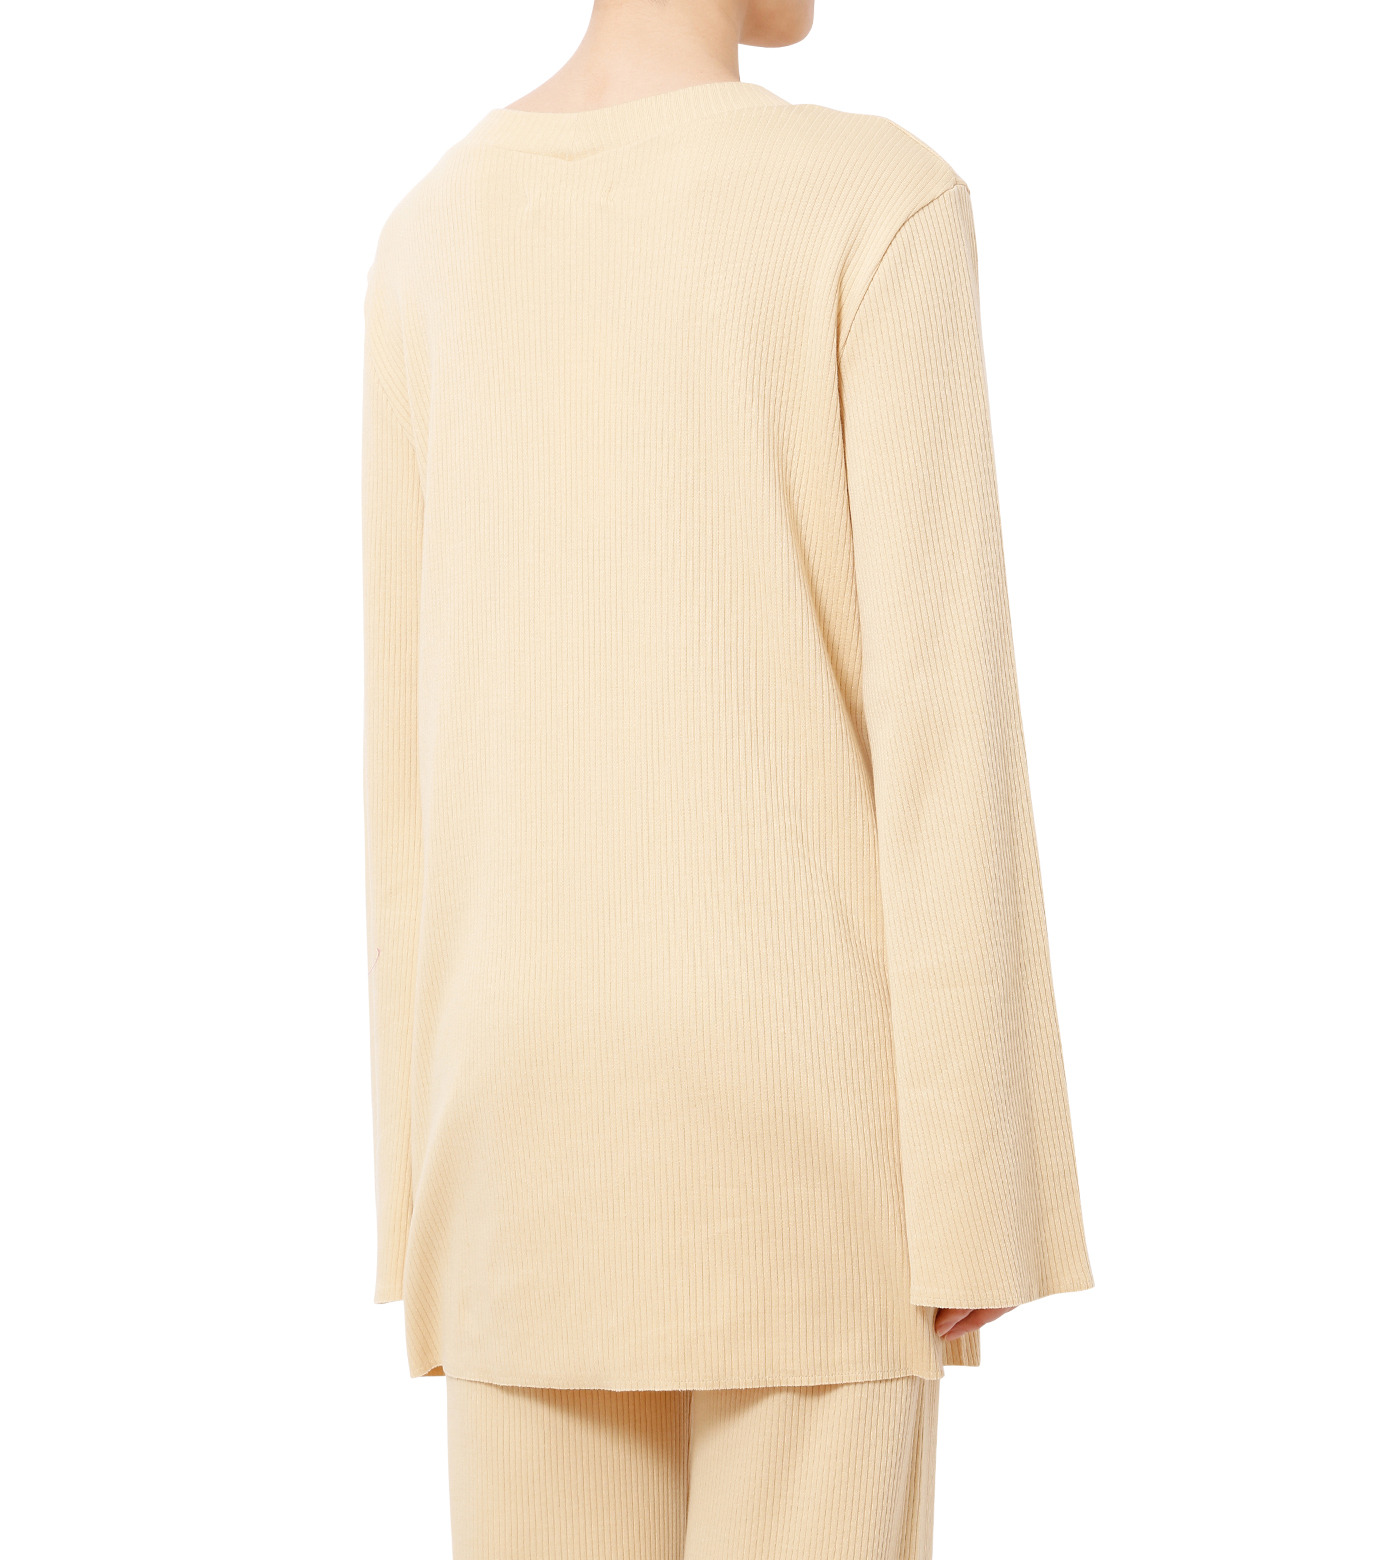 AKANE UTSUNOMIYA(アカネウツノミヤ)のLong Sleeve Rib Knit Pullover-LIGHT BEIGE(ニット/knit)-W16FCT032001-51 拡大詳細画像2